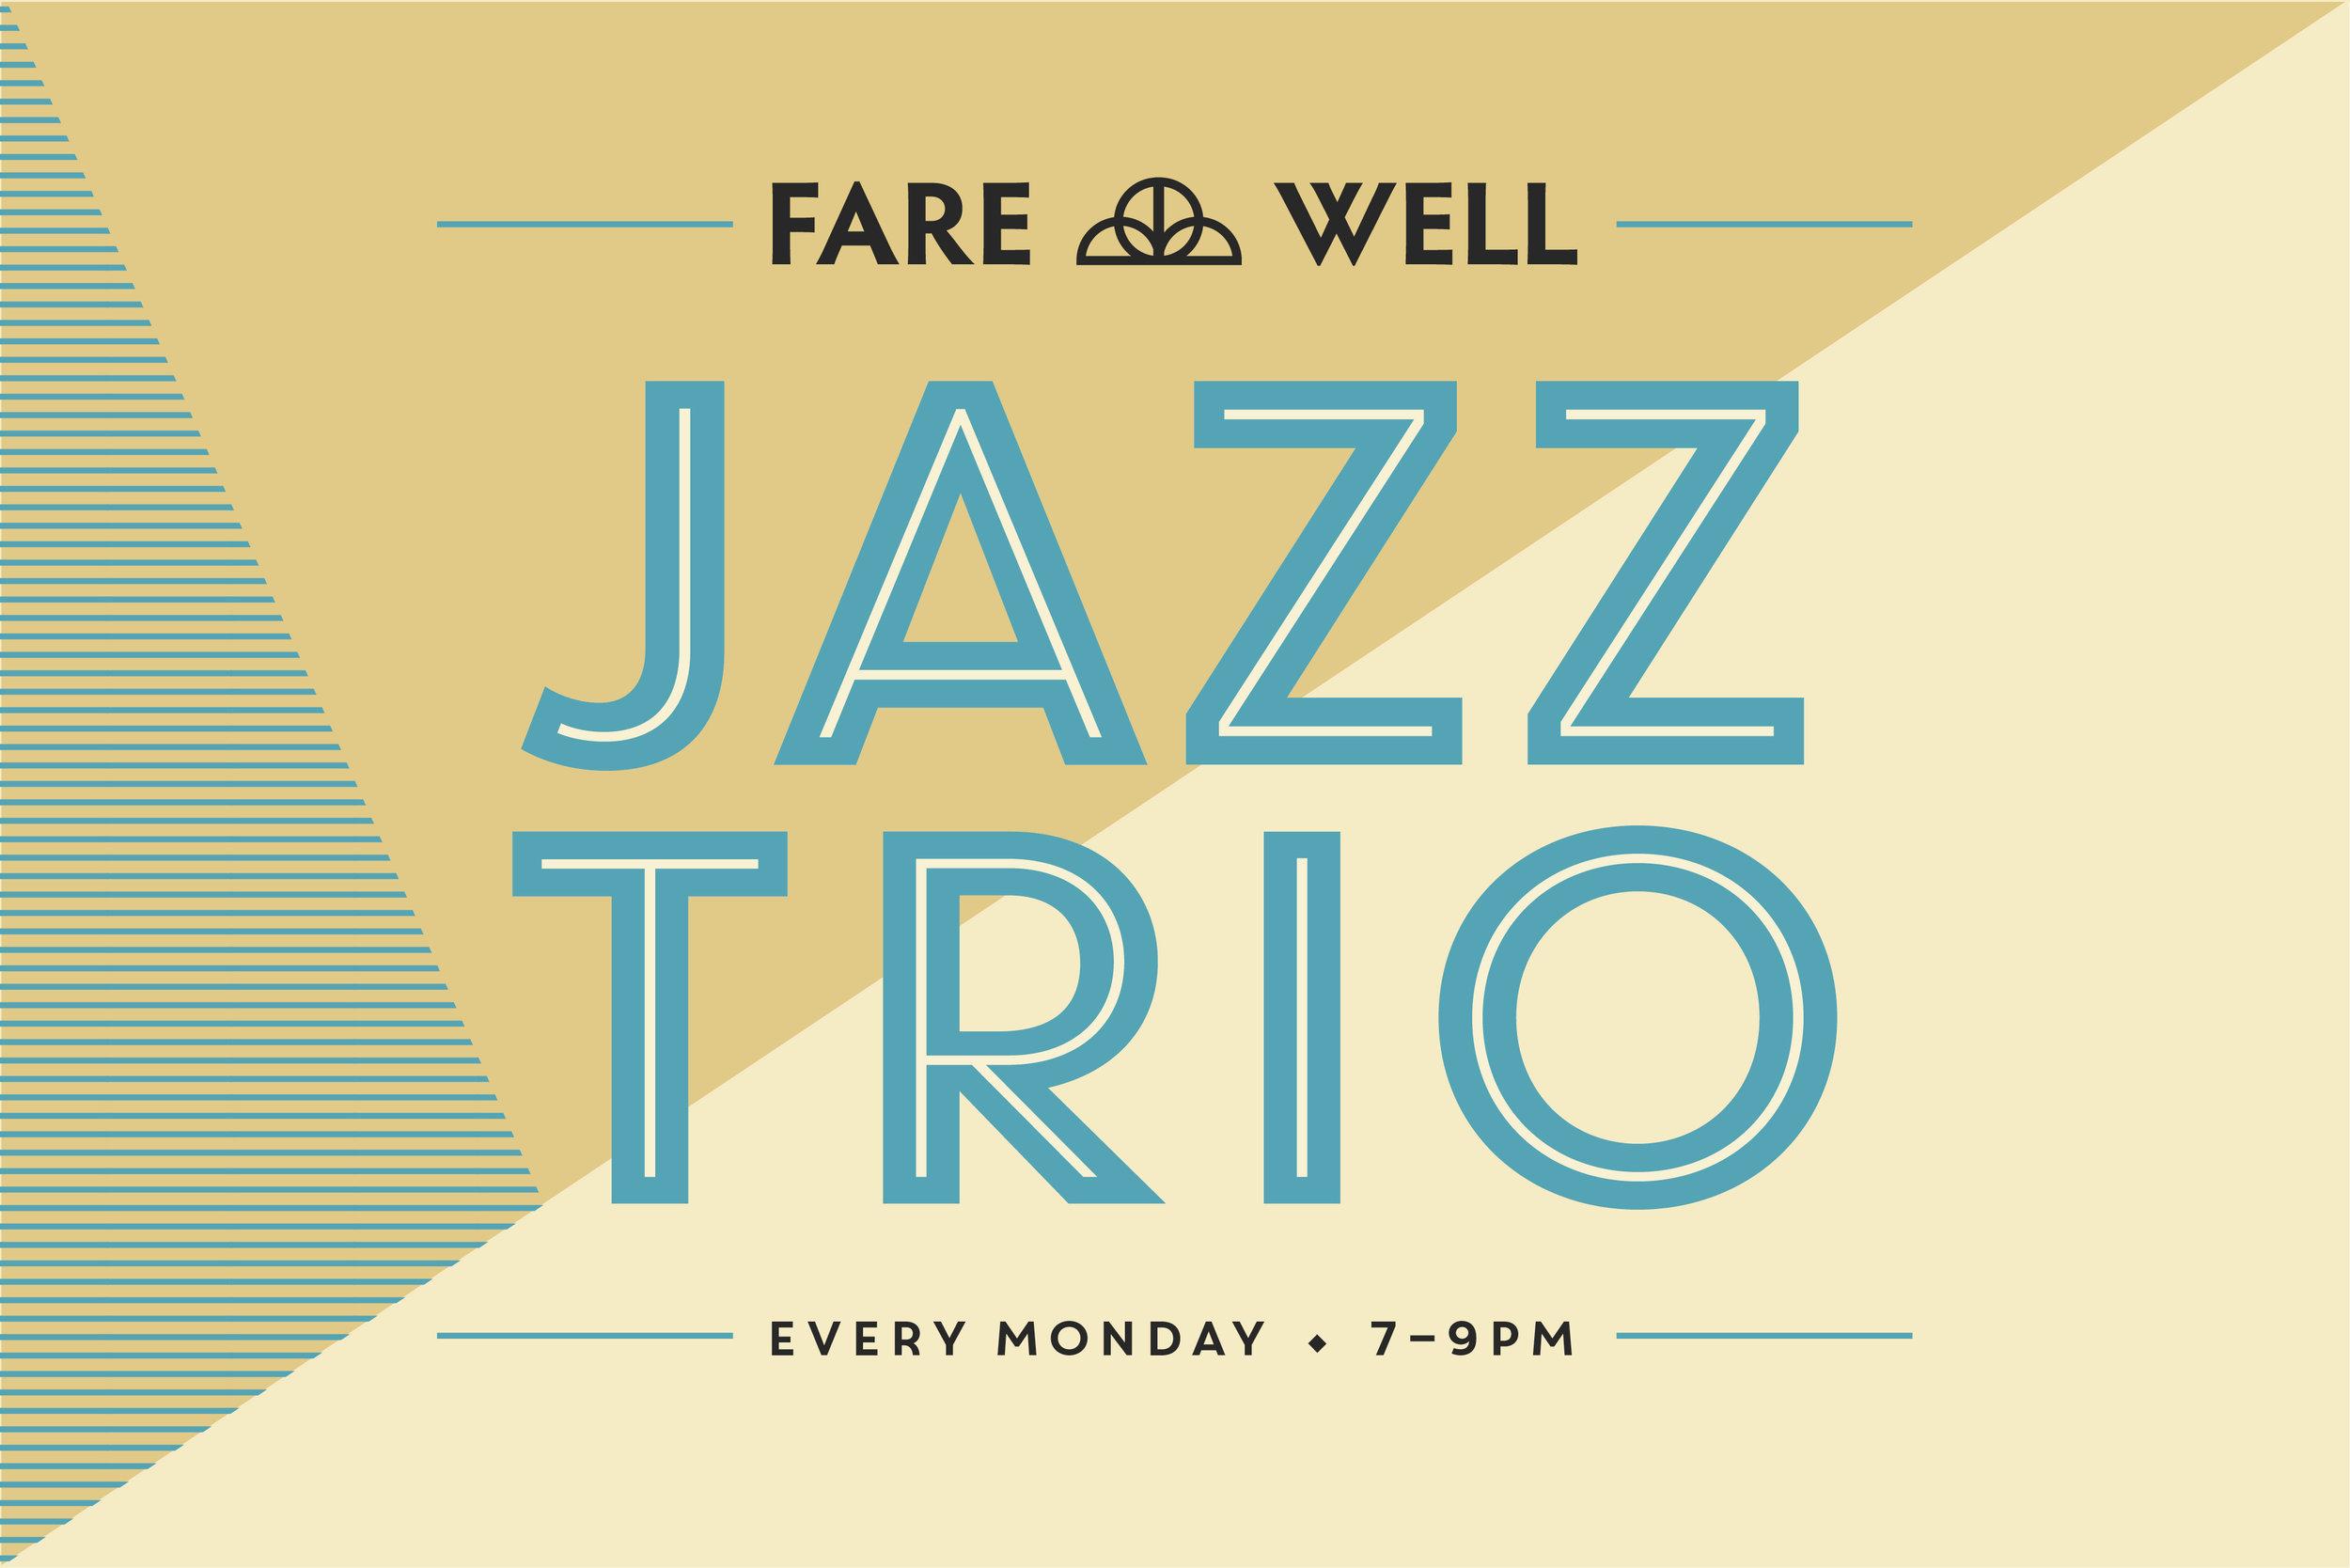 FWL-jazztrio-1_A.jpg